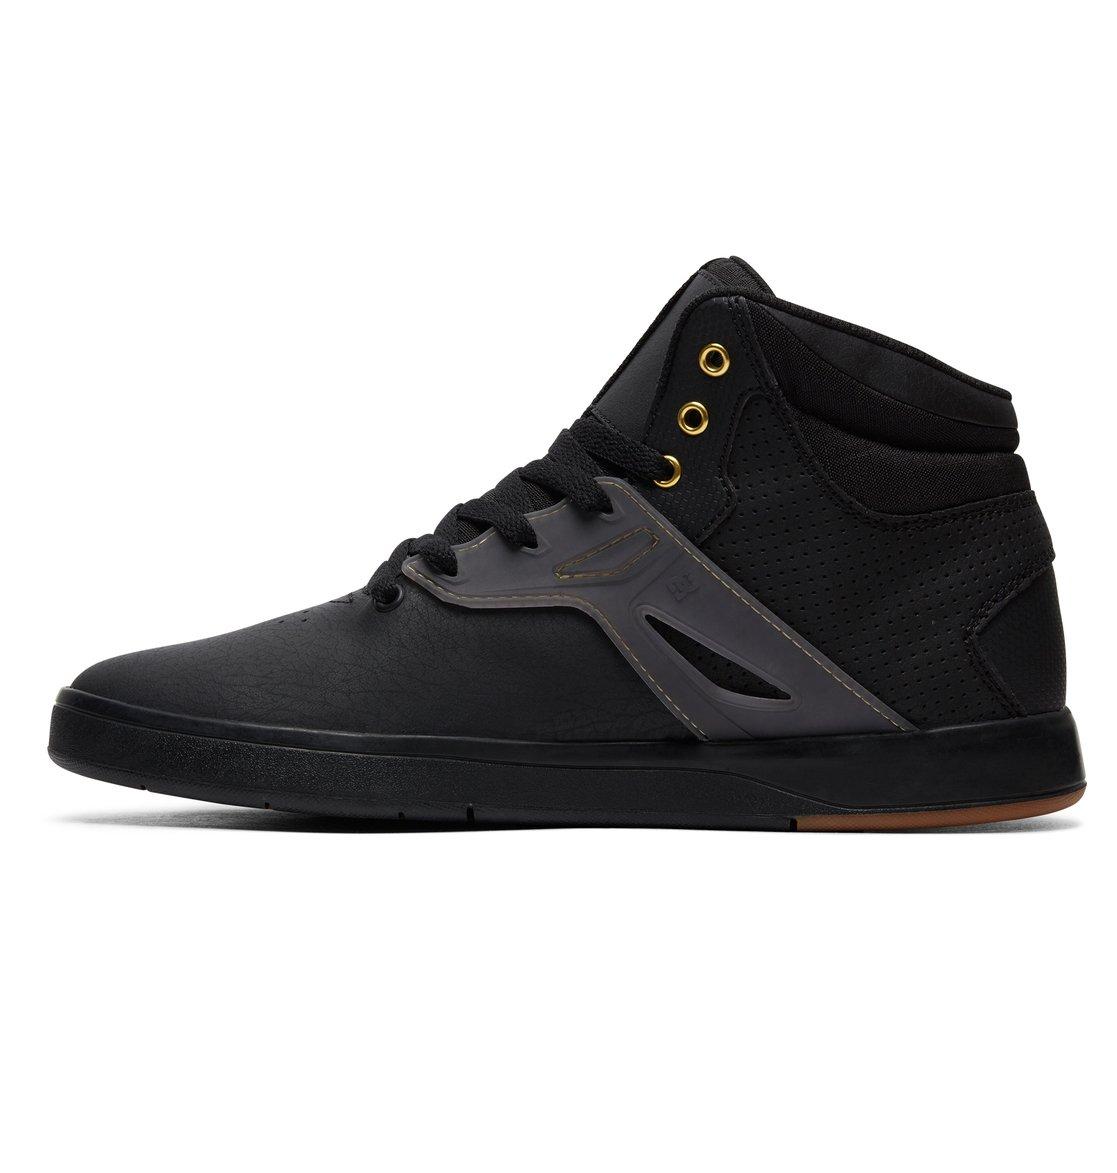 dc shoes Frequency High - Scarpe Alte da Uomo - Black - DC Shoes l7xI6g